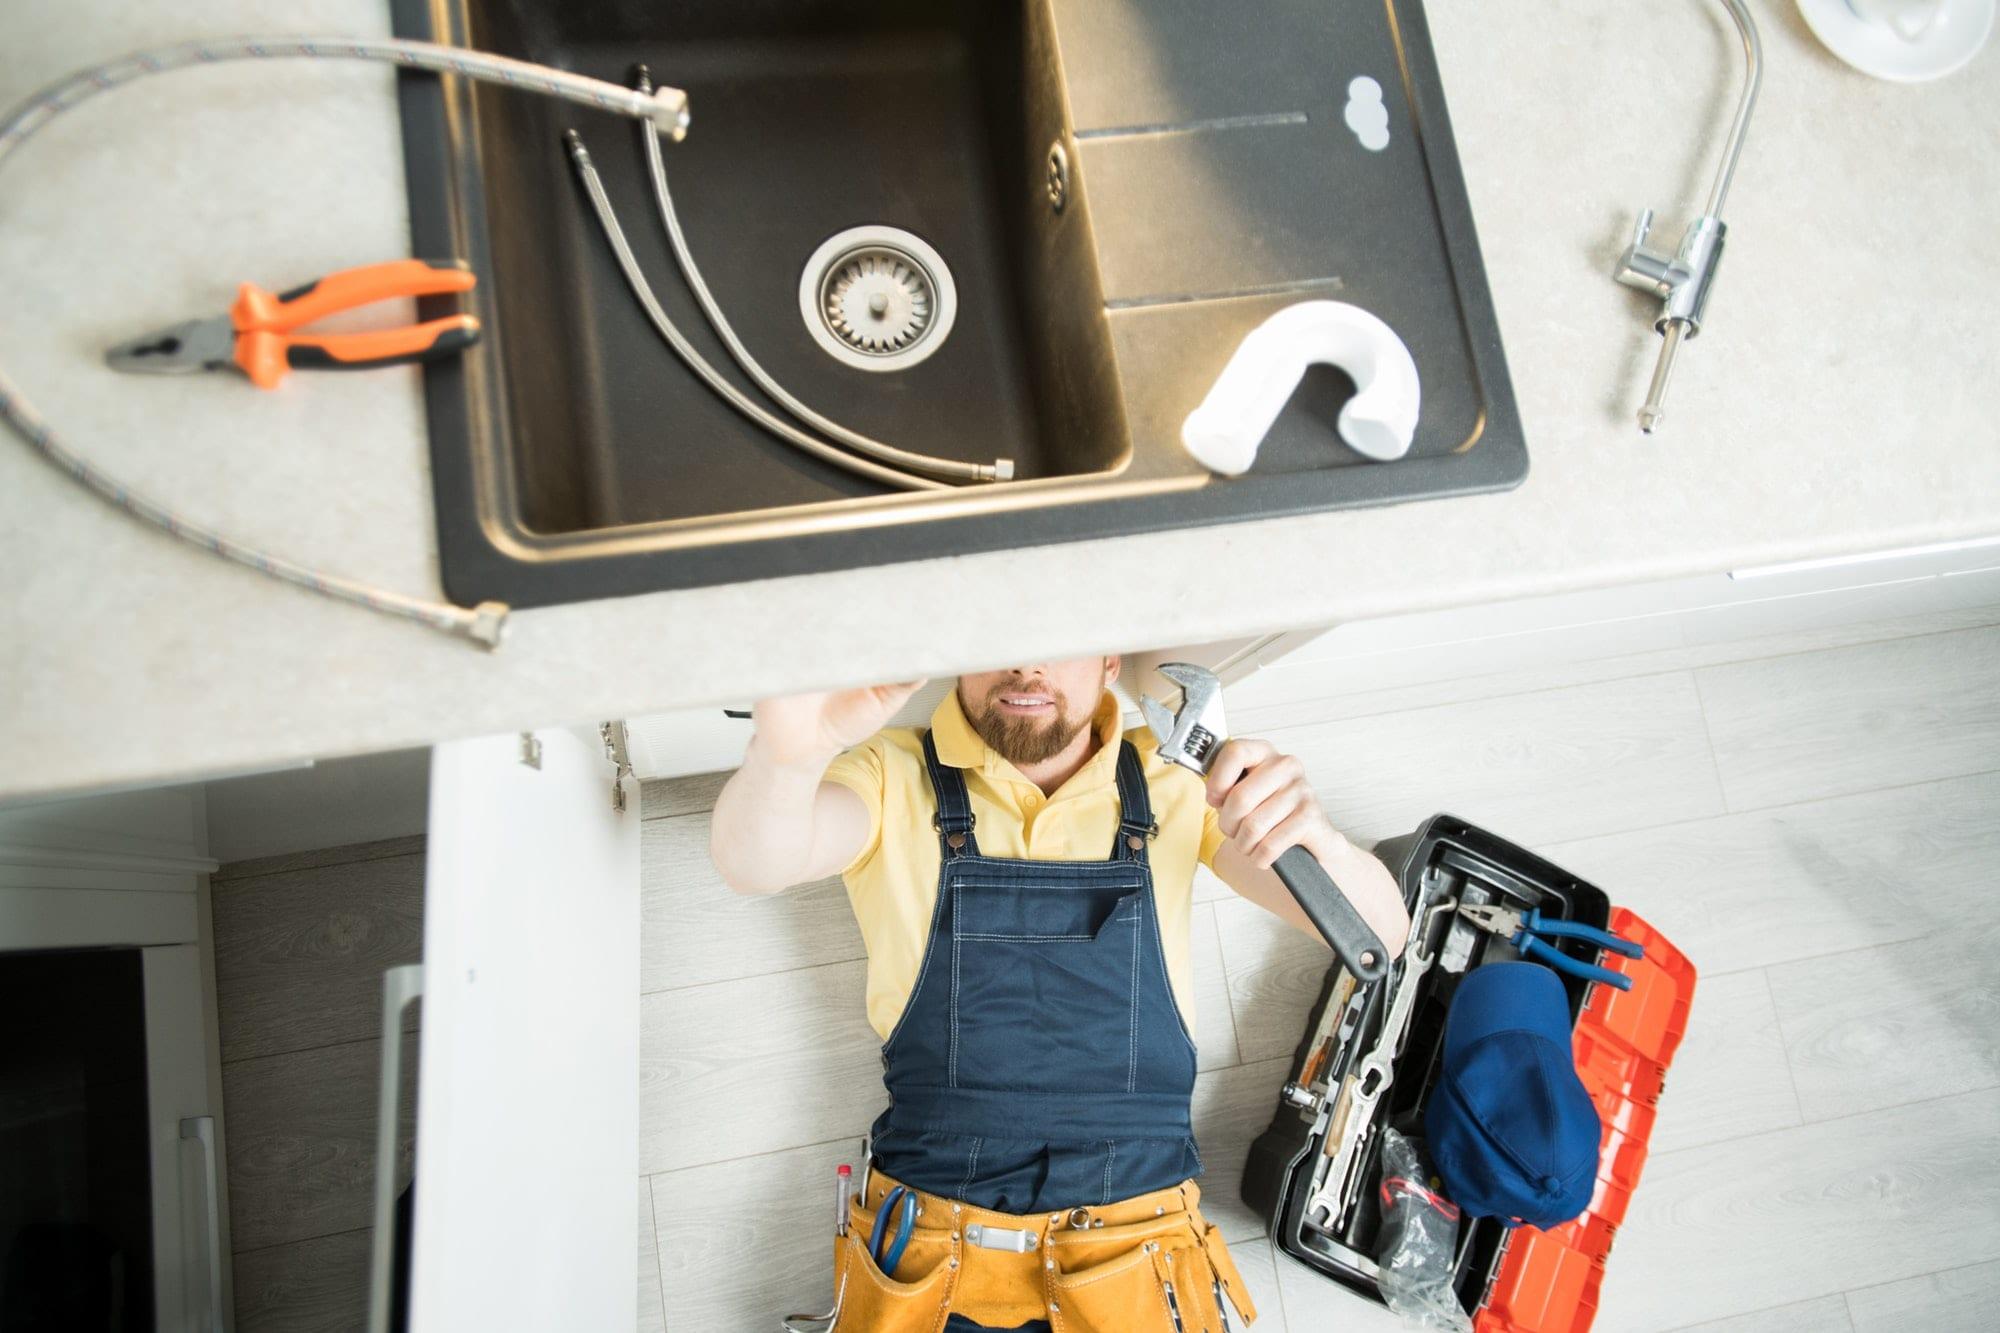 Plumber repairing pipe in kitchen